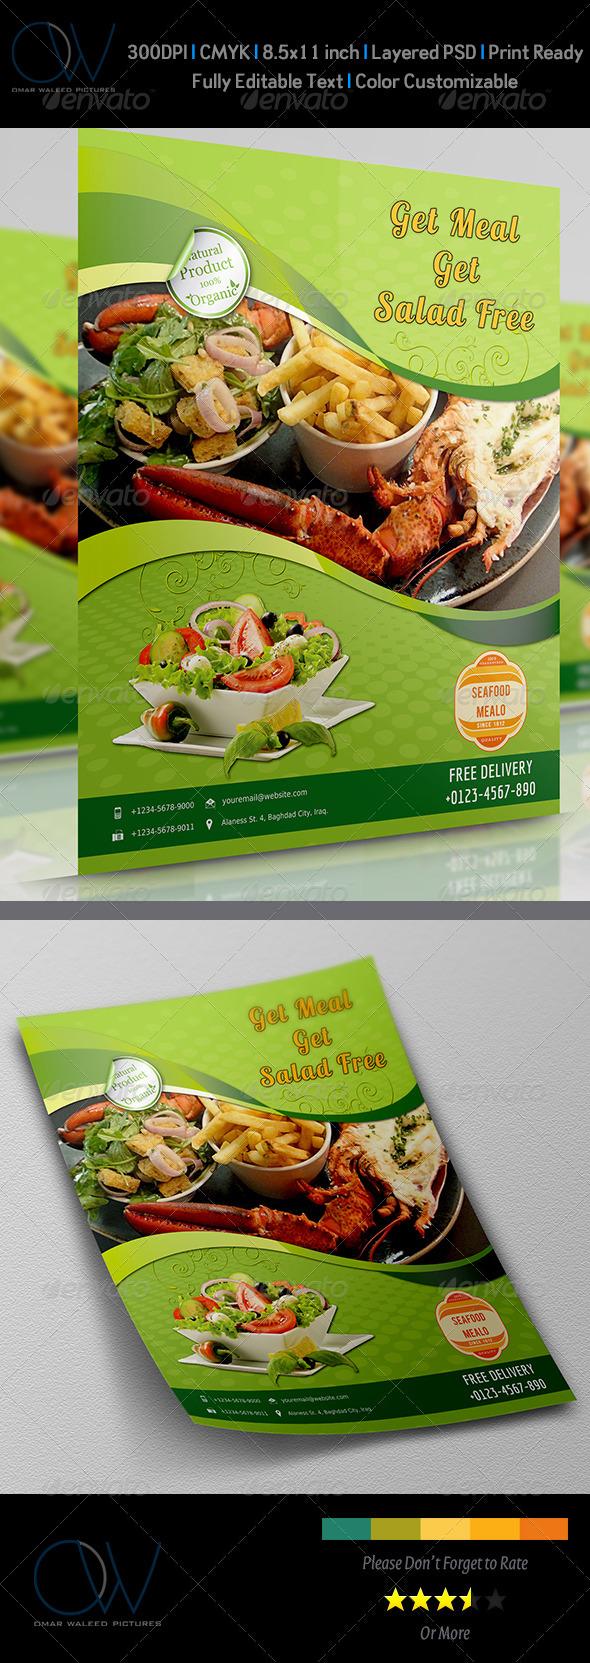 Sea Food Flyer - Restaurant Flyers